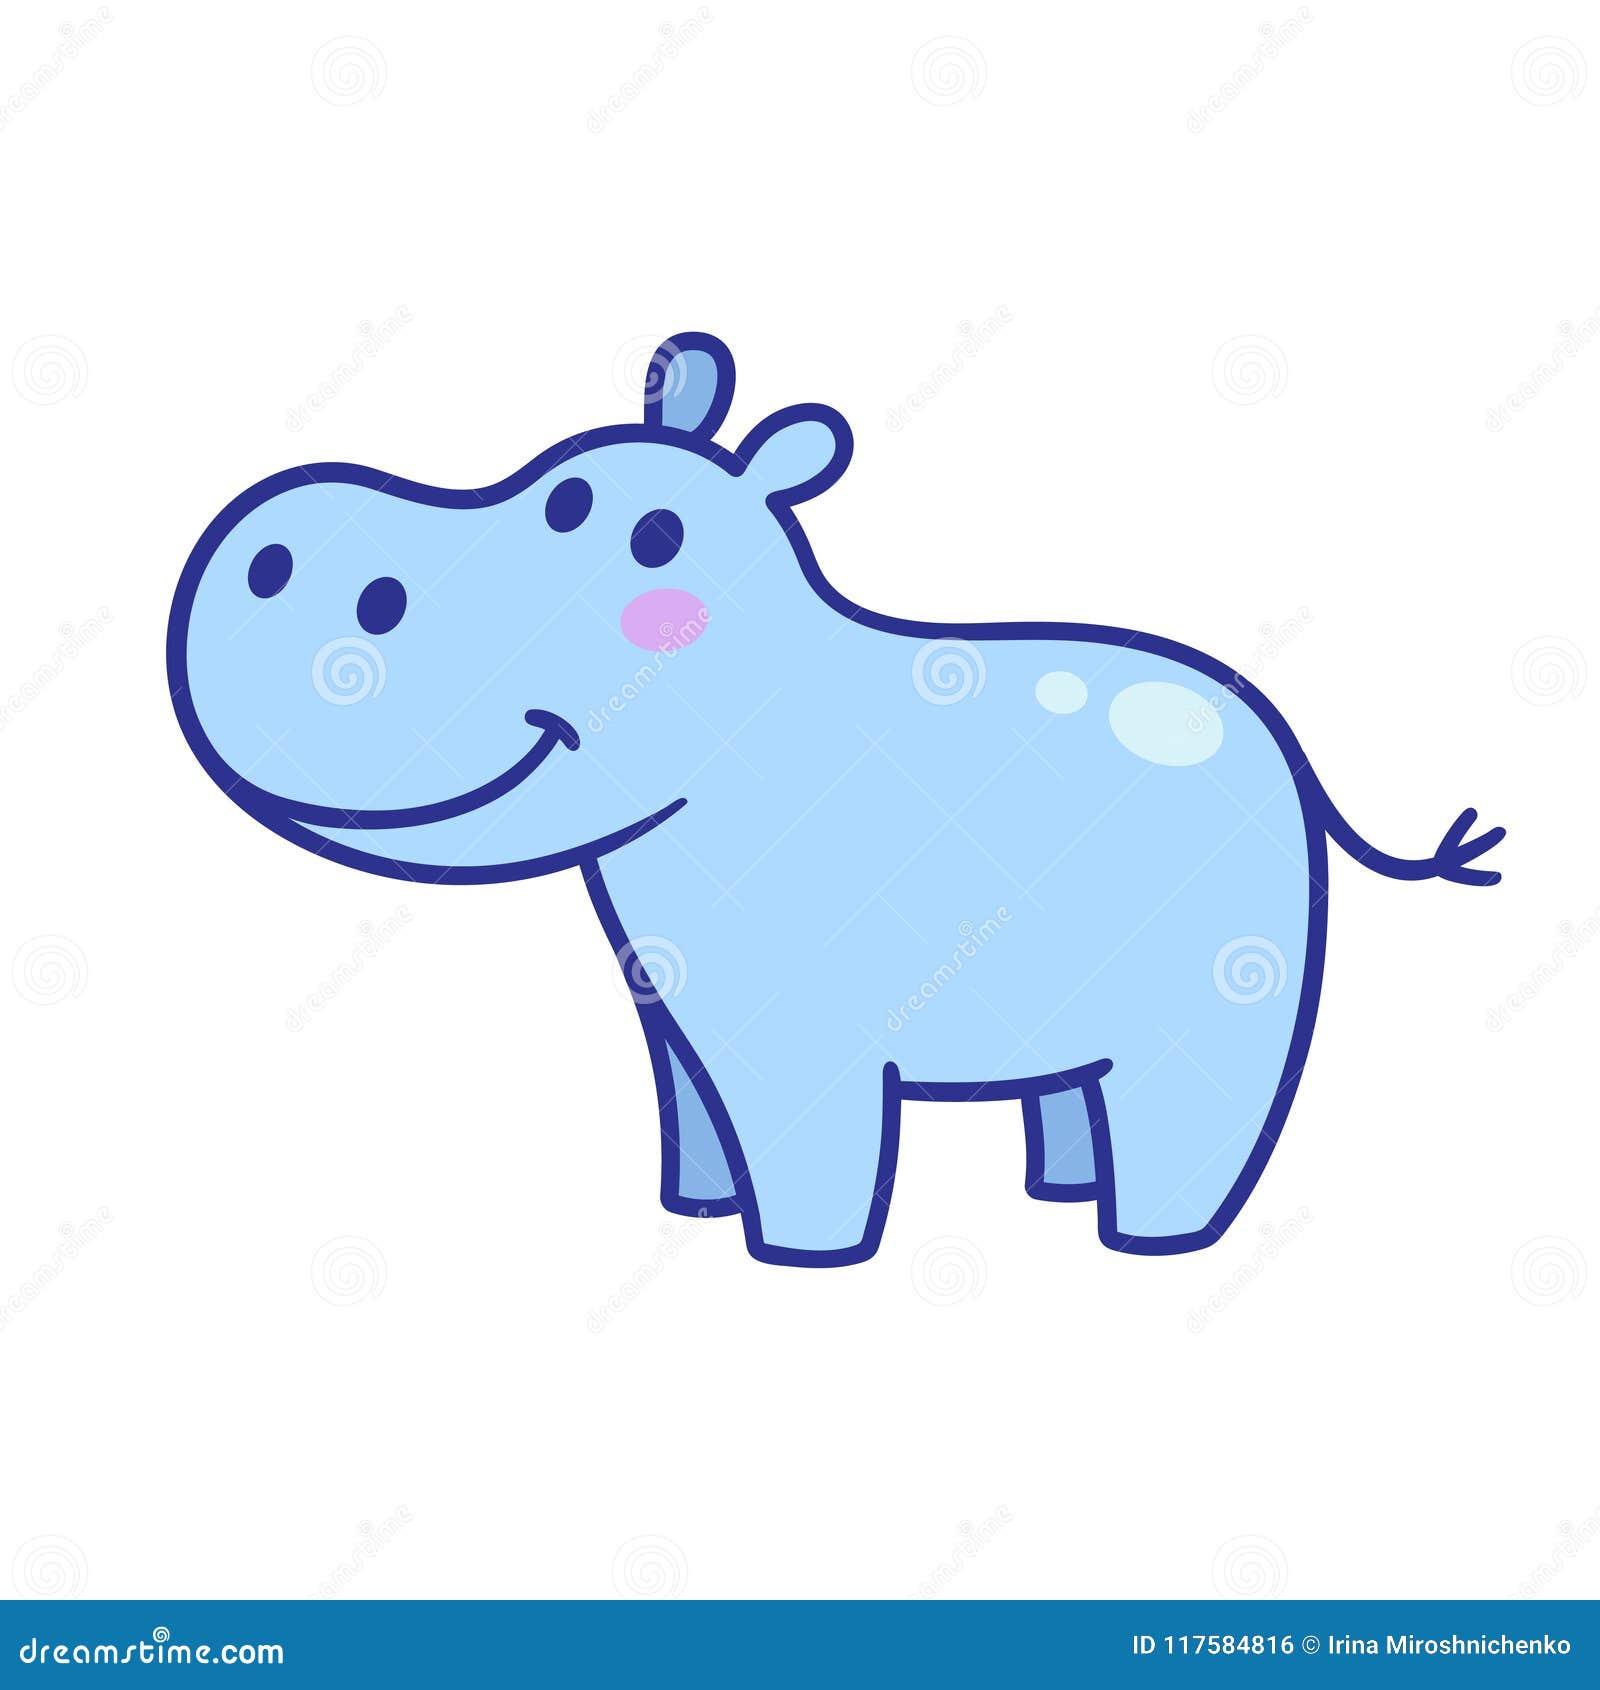 Cute Cartoon Hippo Stock Vector Illustration Of Cheerful 117584816